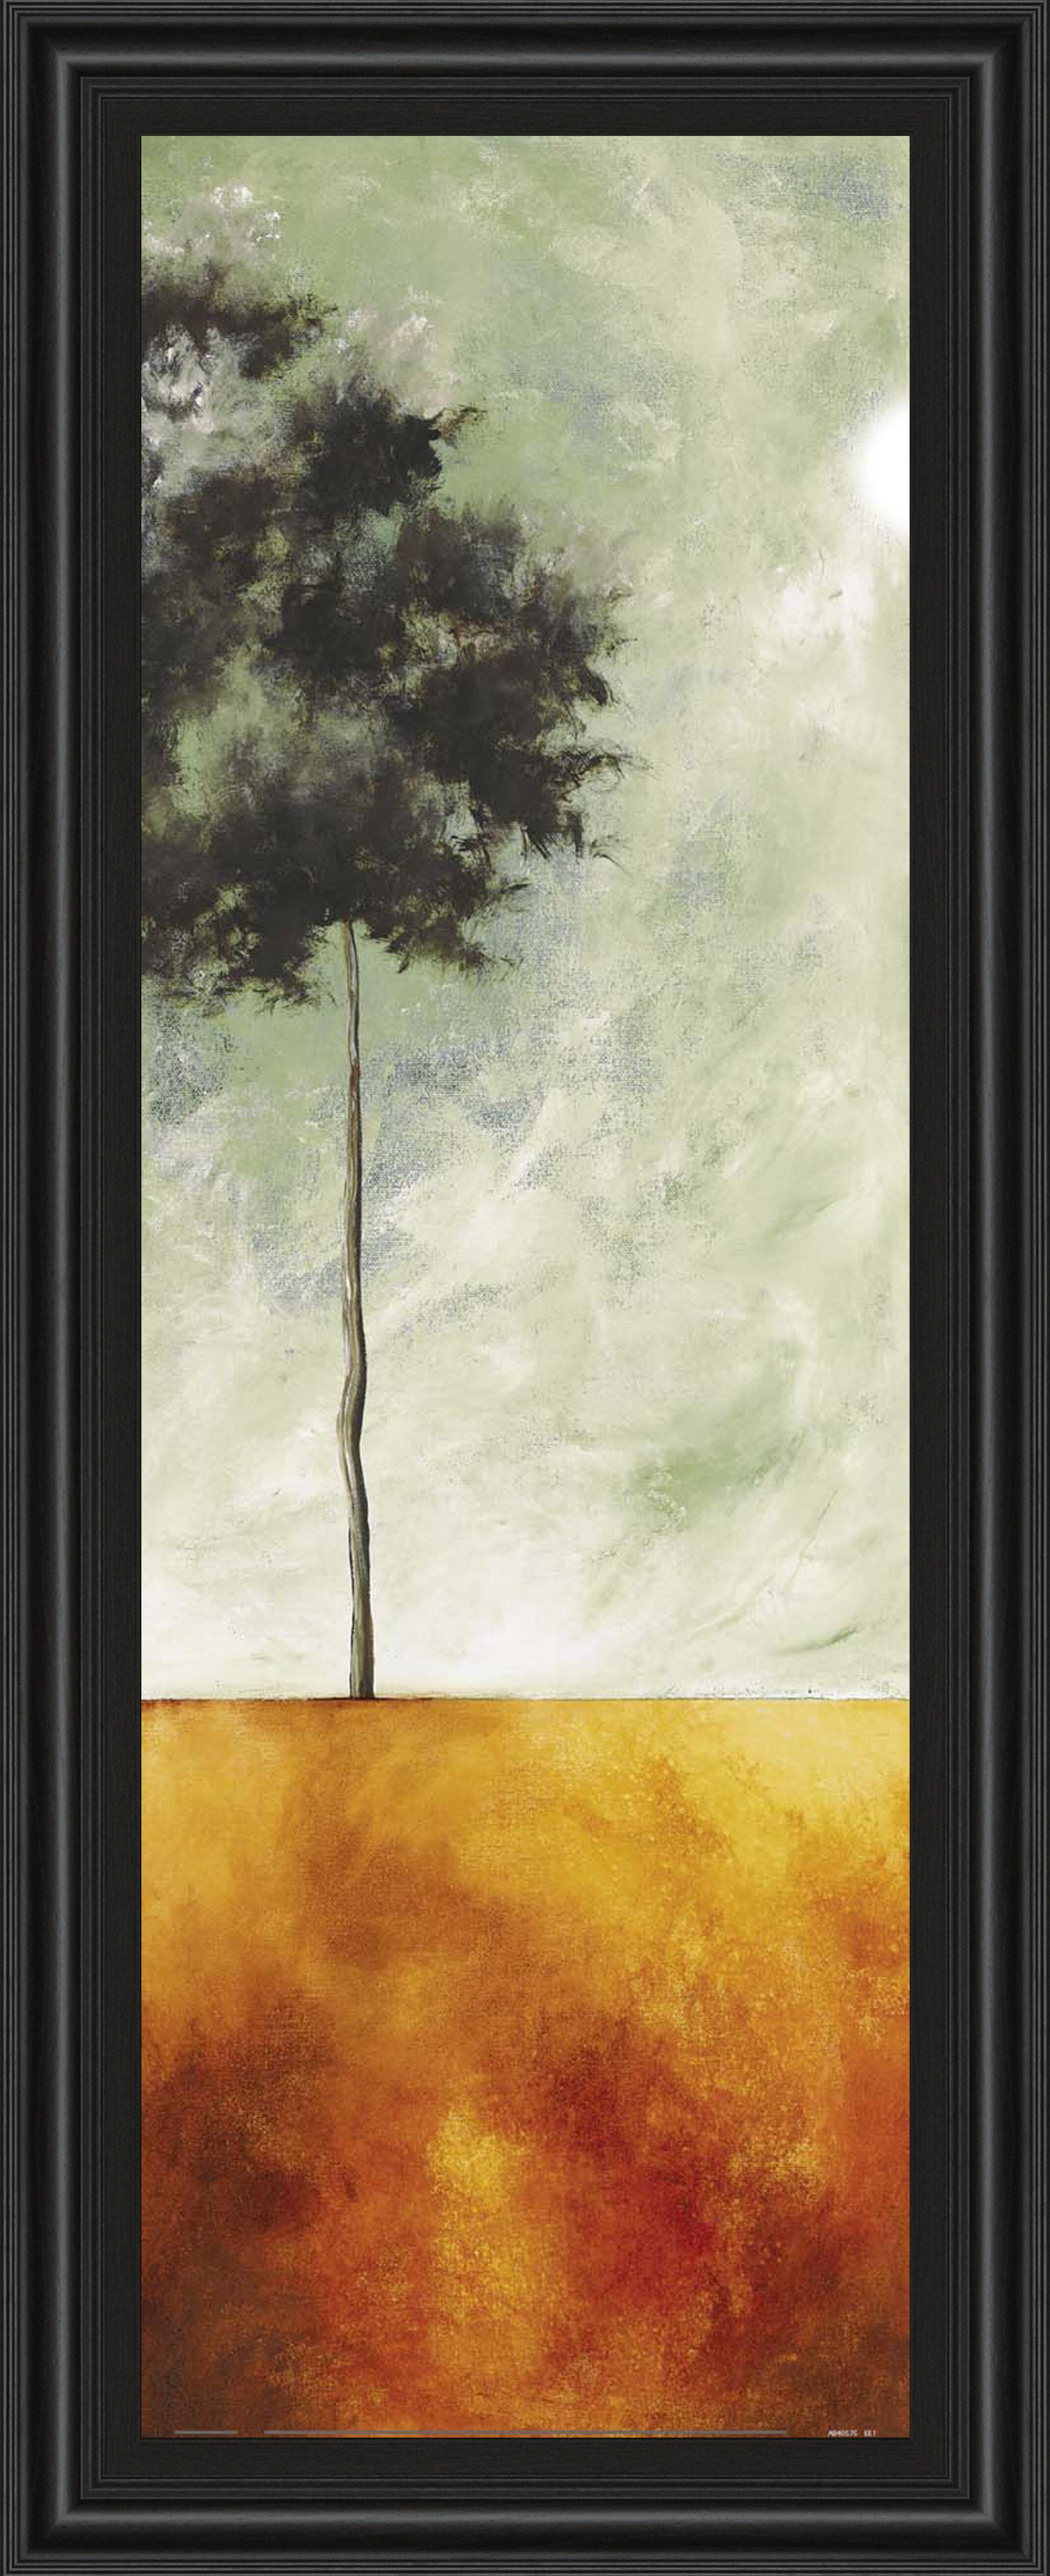 Classyartwholesalers Promotional Line Framed Painting Print Wayfair